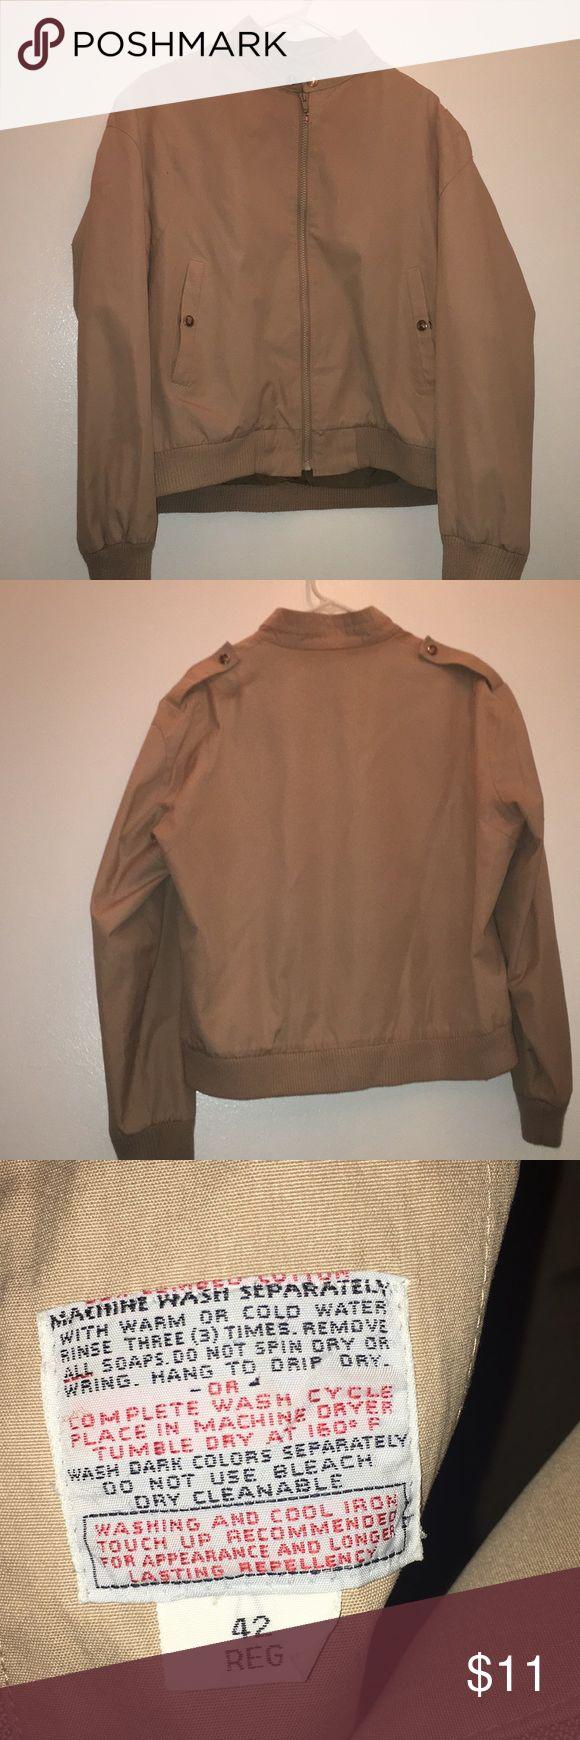 Vintage Brown/Tan Bomber Jacket Brown/Tan/Beige bomber jacket. Size M men's/unisex or Size L women's. 42 reg in men's. Price negotiable. Jackets & Coats